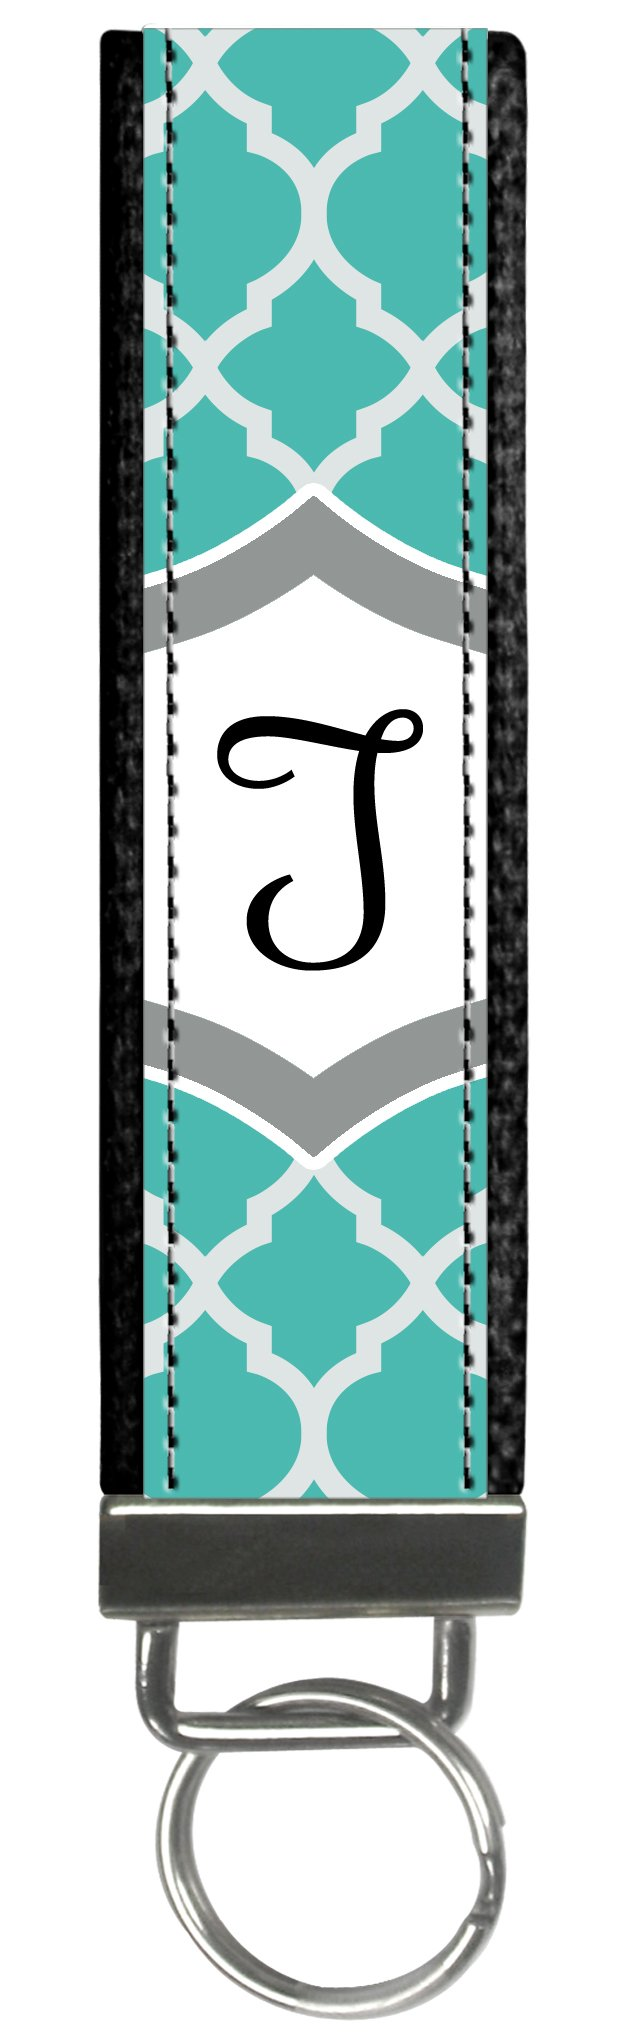 Snaptotes Teal Moroccan Design Monogram Wristlet Keyfob Keychain